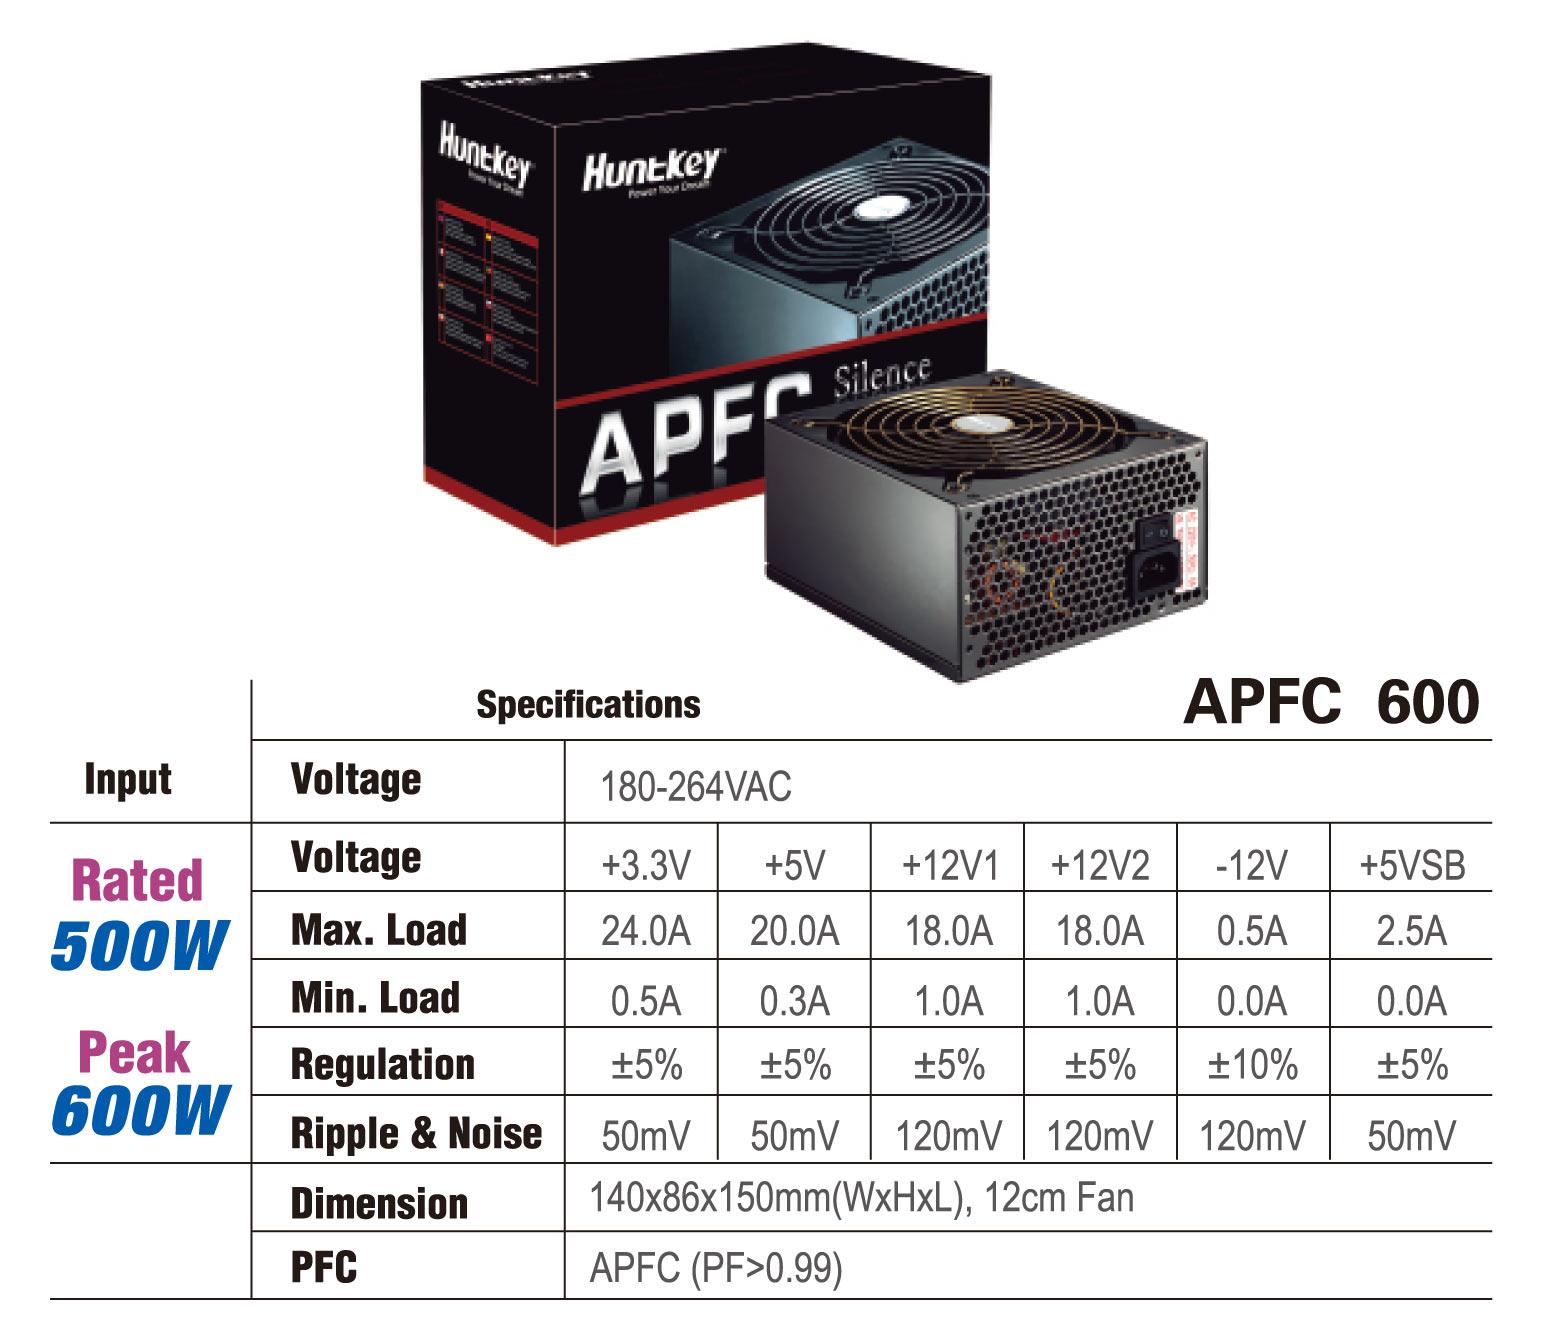 11-43 APFC 600